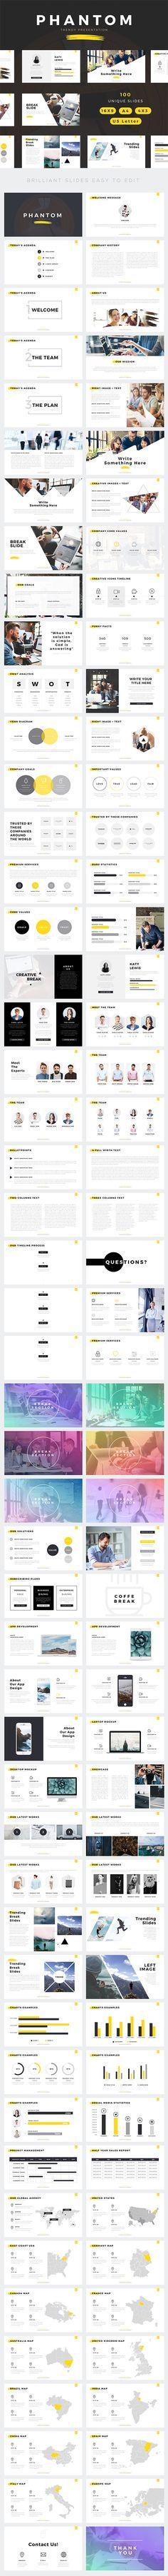 Phantom Modern Powerpoint Template. Download: https://graphicriver.net/item/phantom-modern-powerpoint-template/18705353?ref=thanhdesign